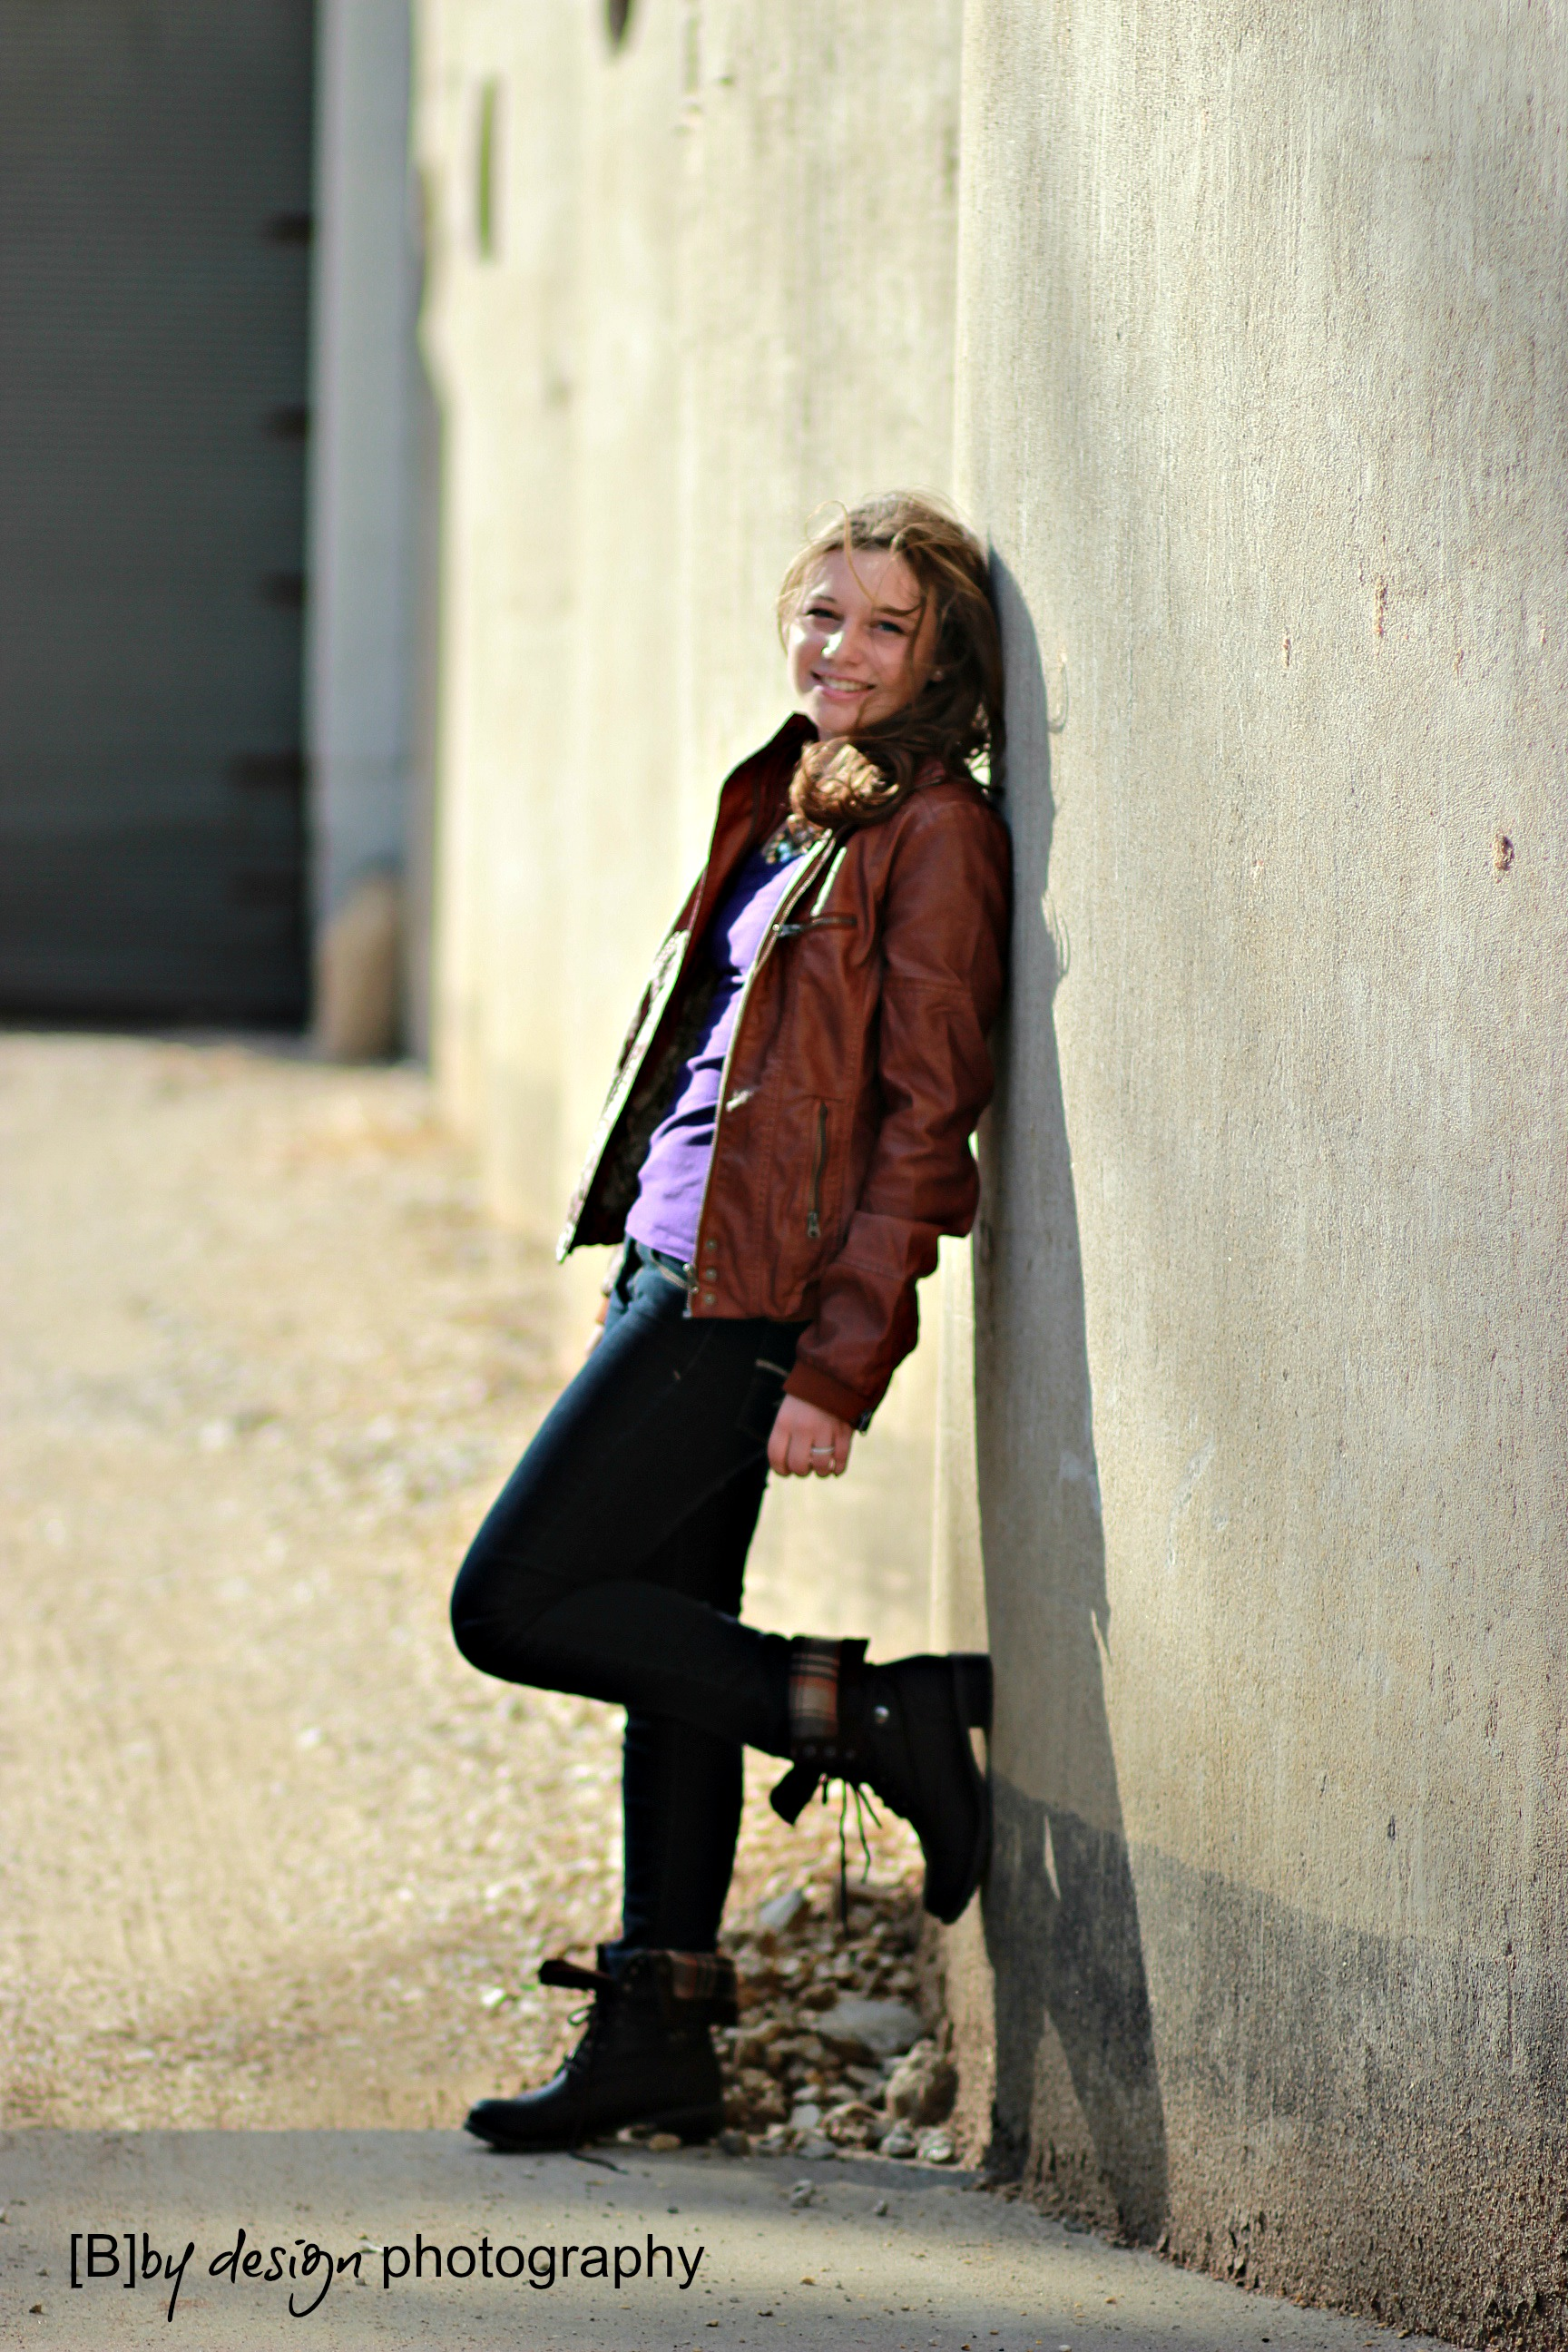 Brianna Sr. pix 205.jpg